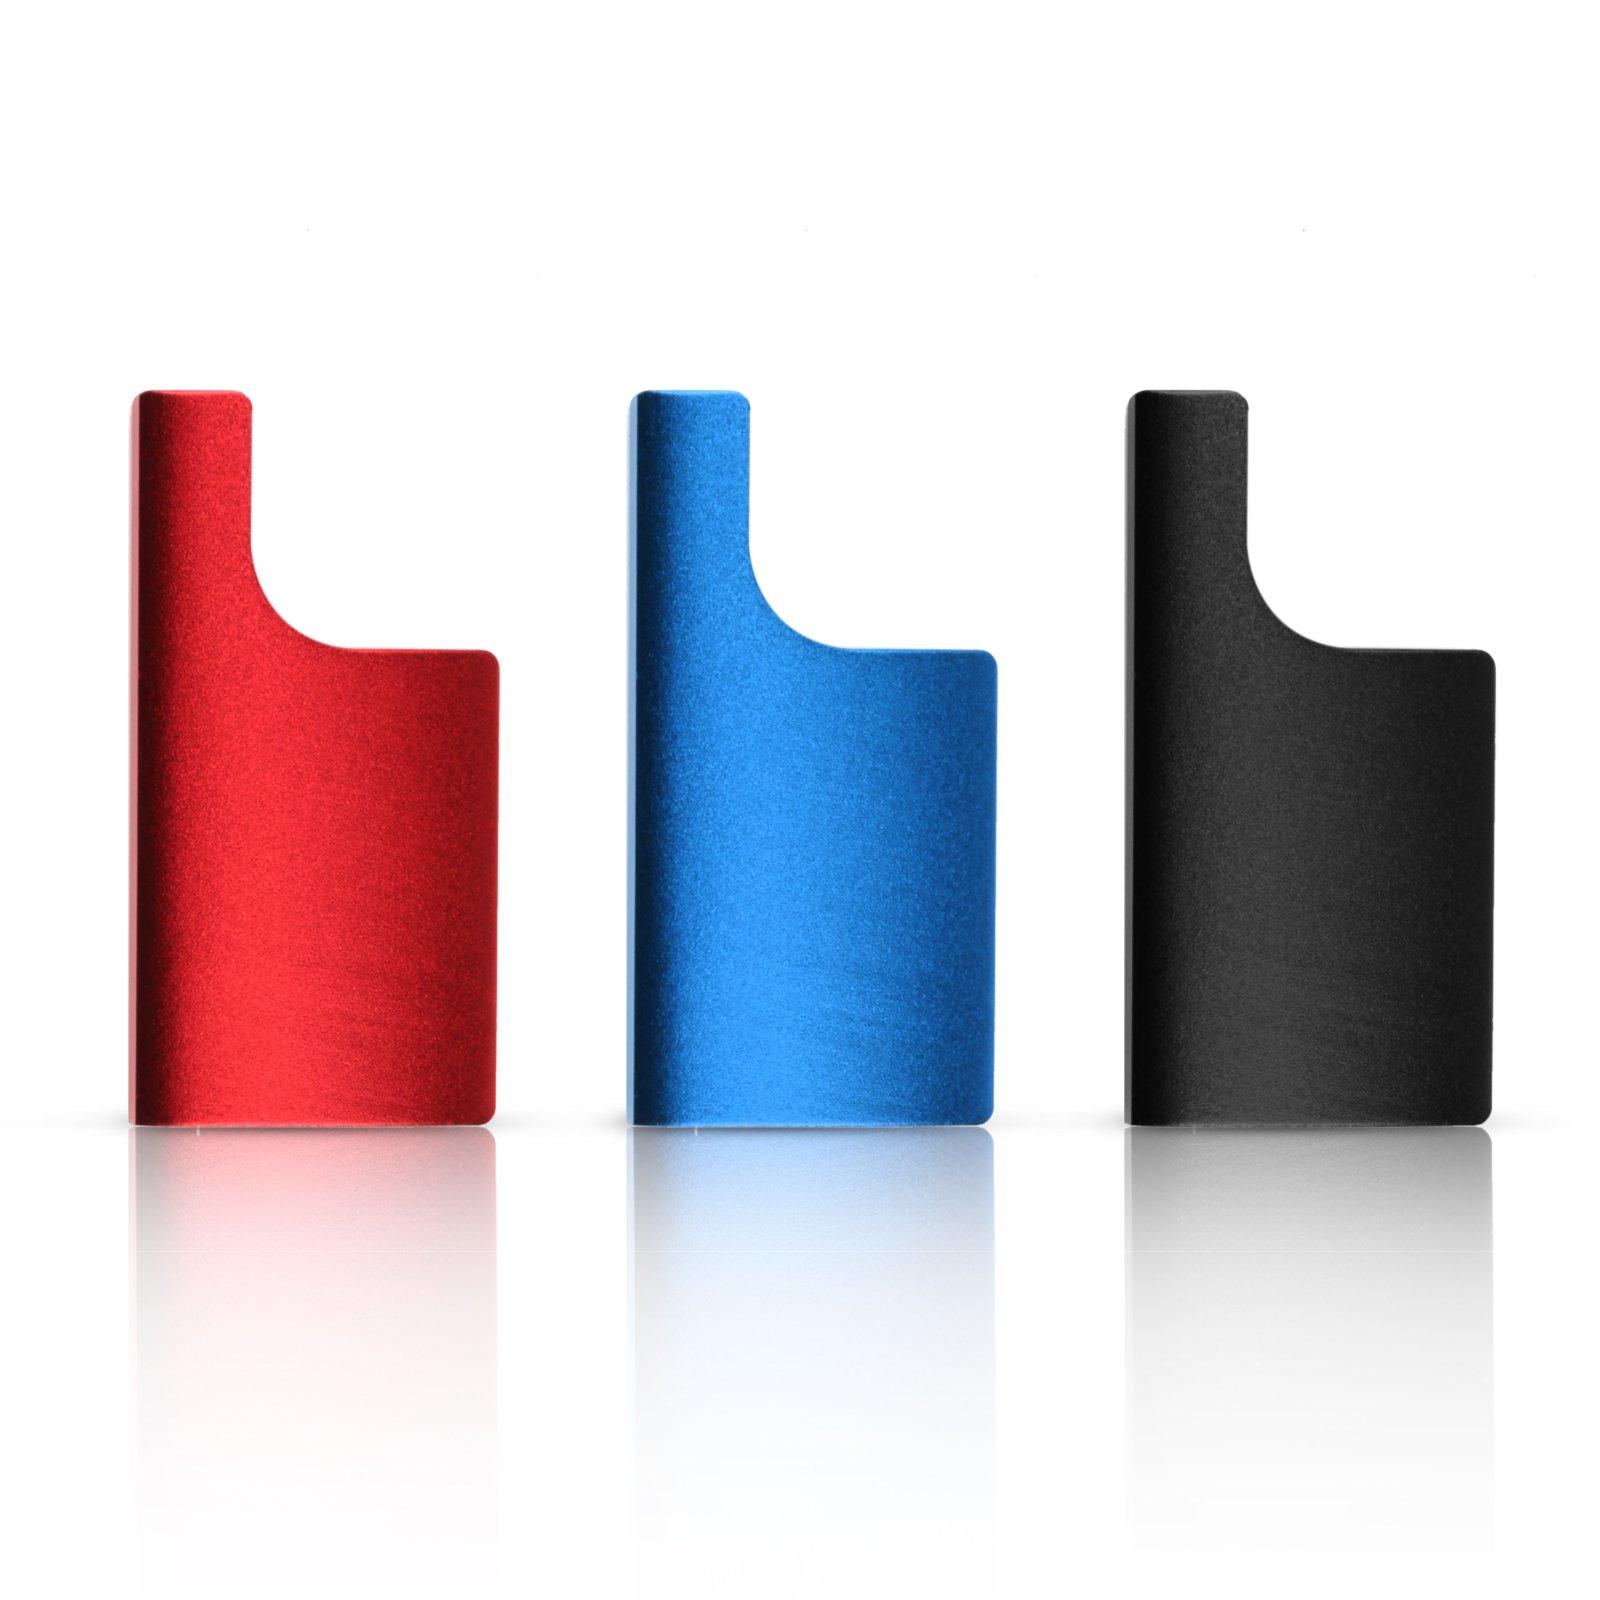 SHOOT 3PCS Multi-color Metal CNC Aluminum Replacement Rear Snap Latch Clip Standard Underwater Standard Waterproof Skeleton Housing Buckle Lock for GoPro HERO 3+/4 Camera Accessories (Red,Blue,Black)